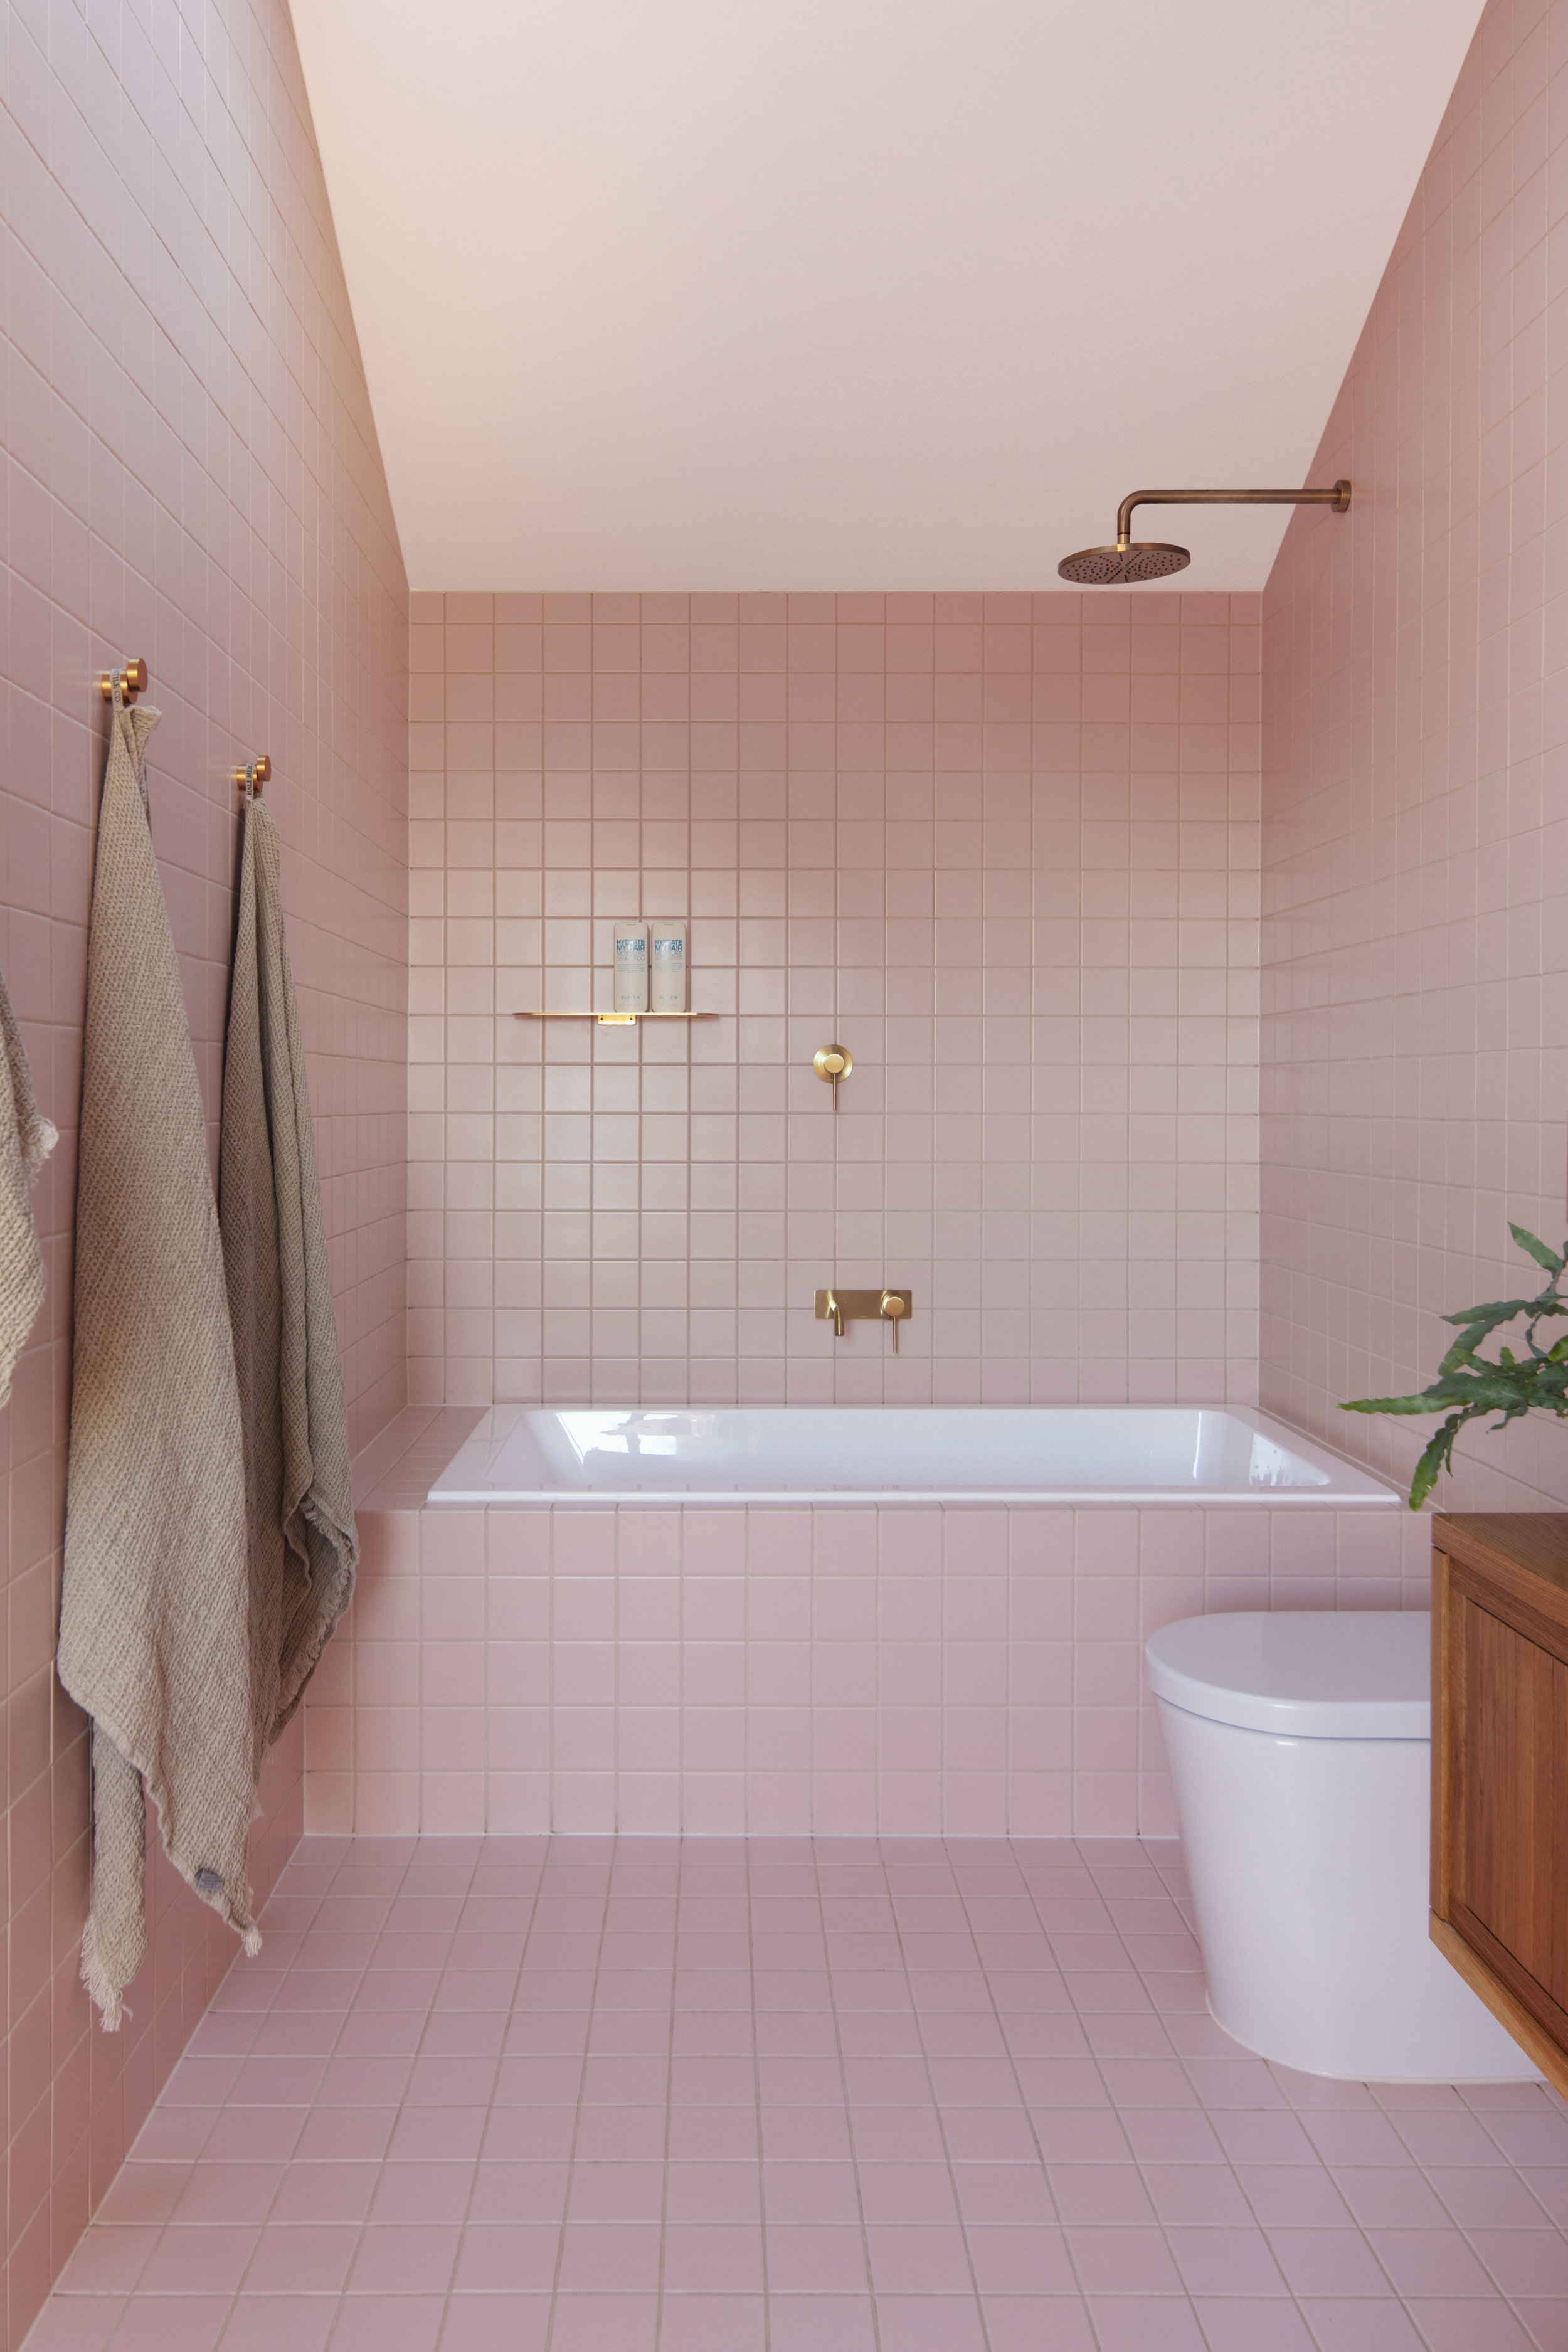 MANI-One Mani House-043_Int Colour-Pink Bath.jpg